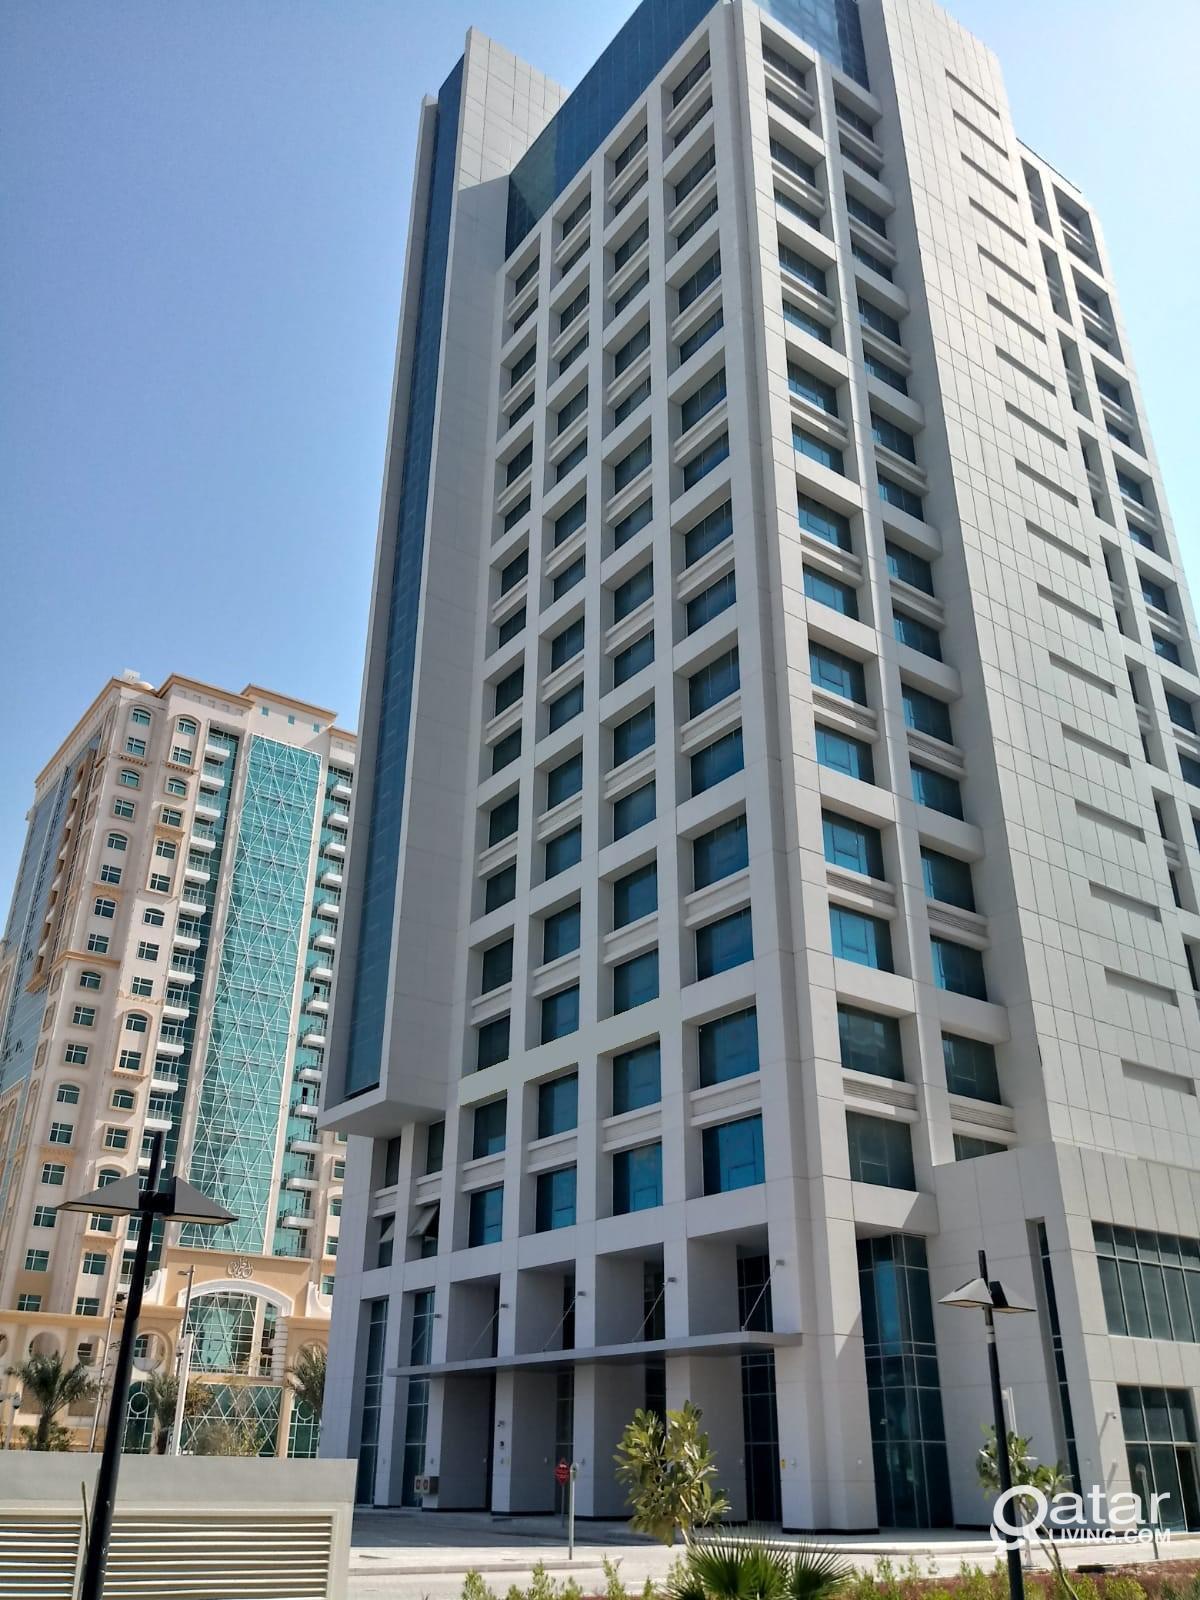 Office For Rent in Lusail - مكاتب في اللوسيل